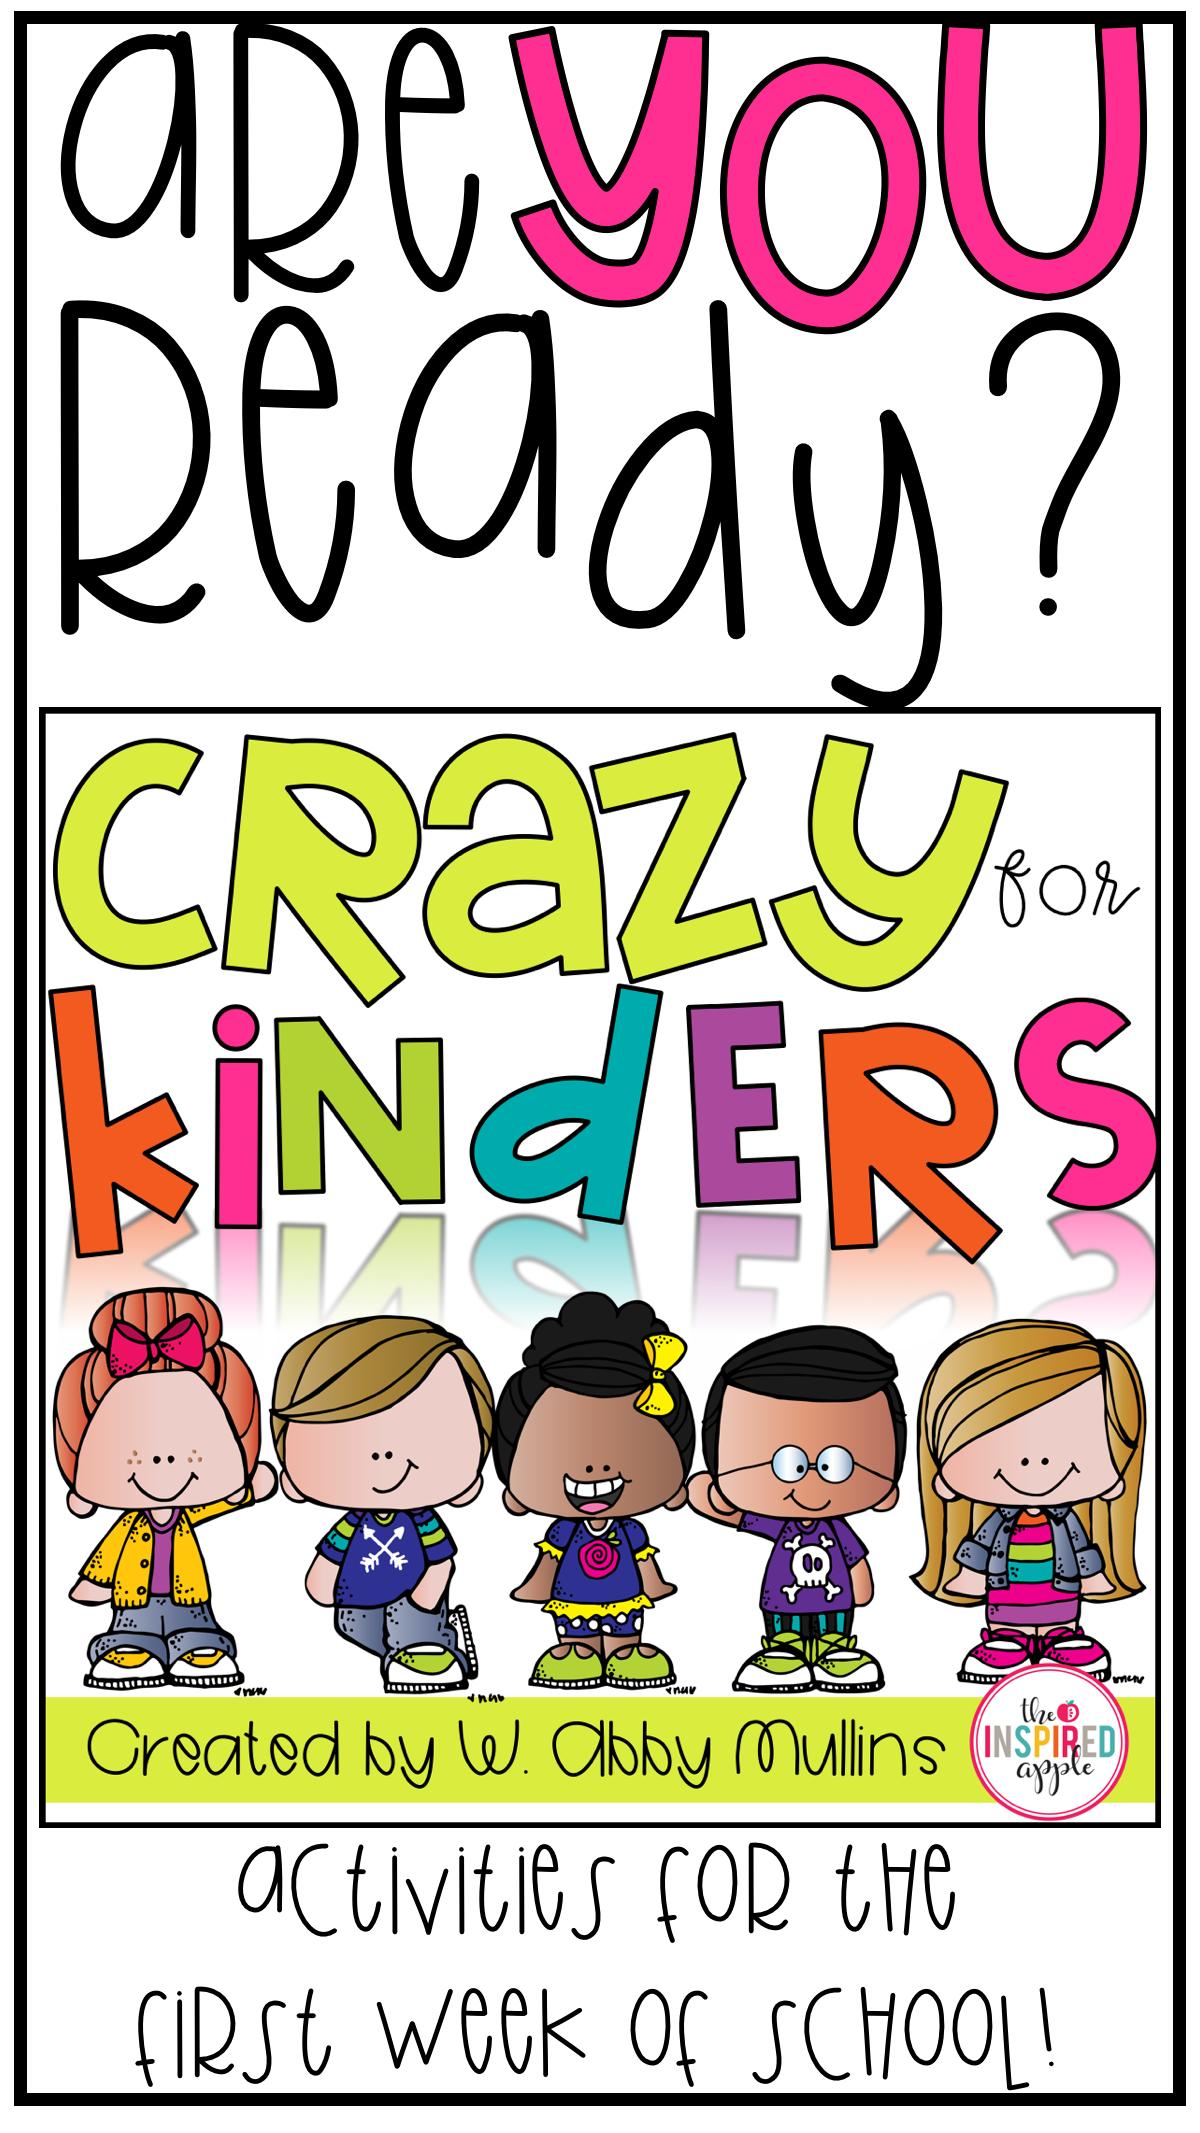 1cd79cdb12c35fcbbfef96a8553526be - First Day Of Kindergarten Activities